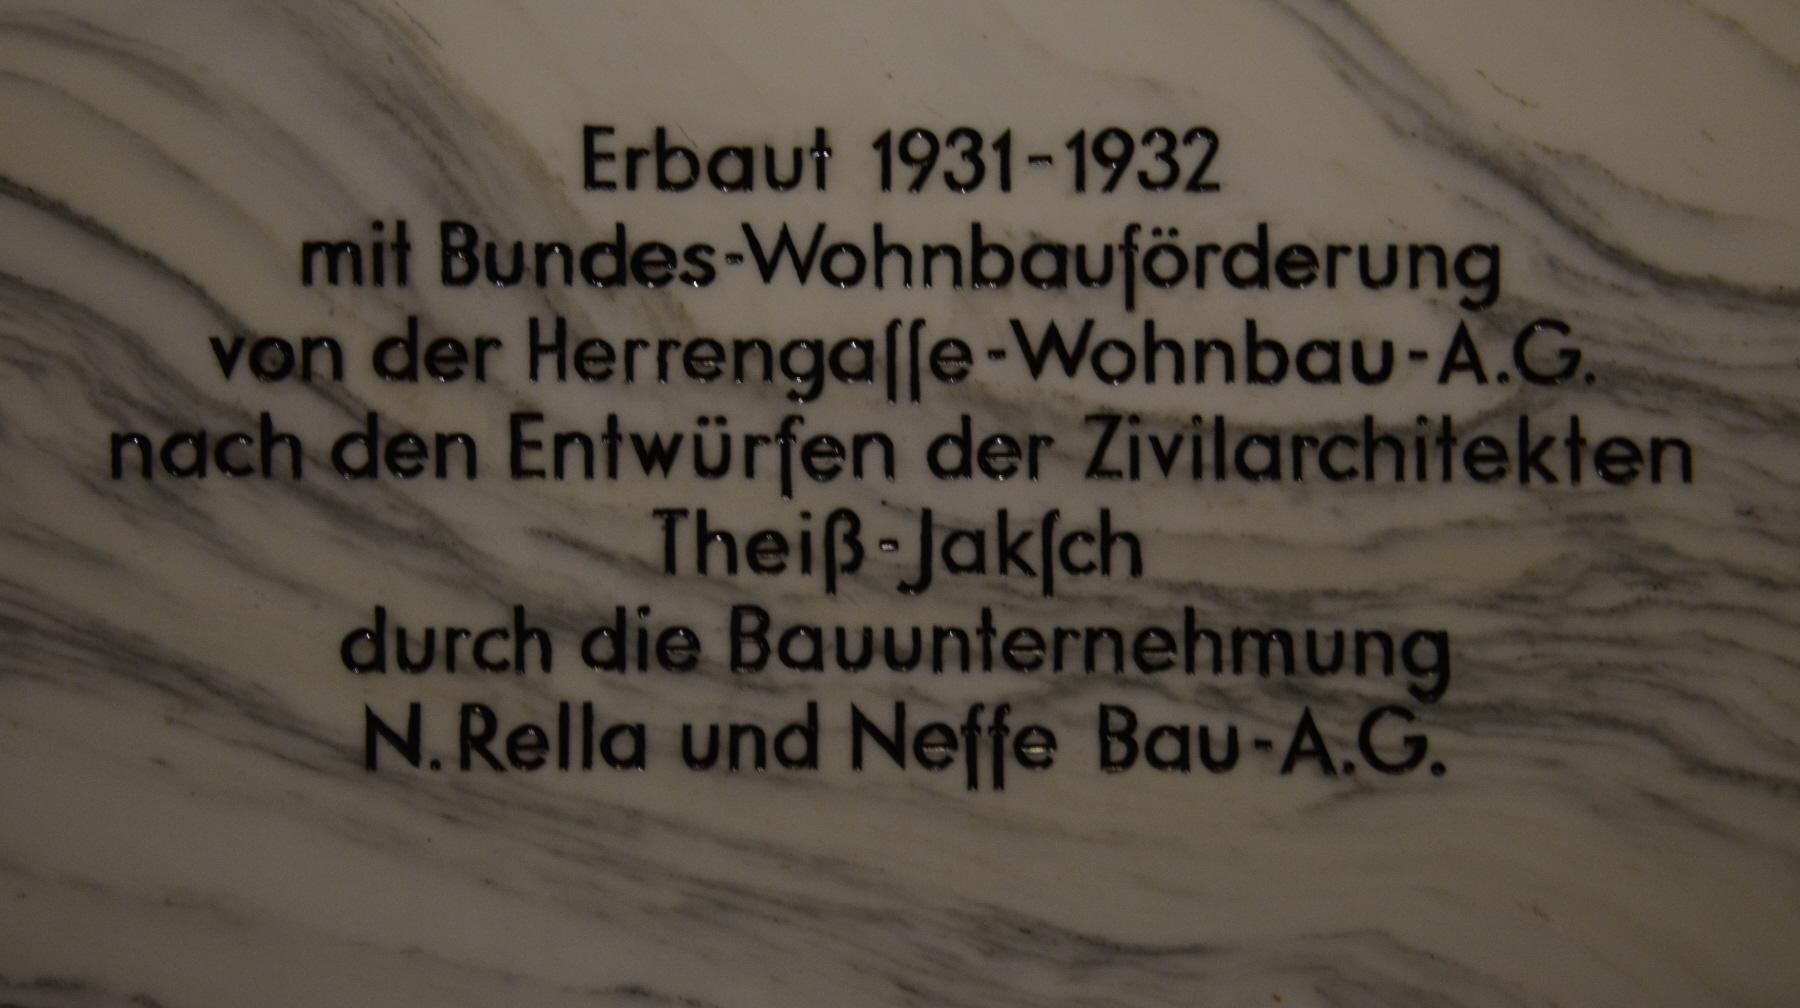 GuentherZ 2014-09-13 (2) Wien01 Herrengasse Hochhaus Herrengasse GedenktafelB.JPG